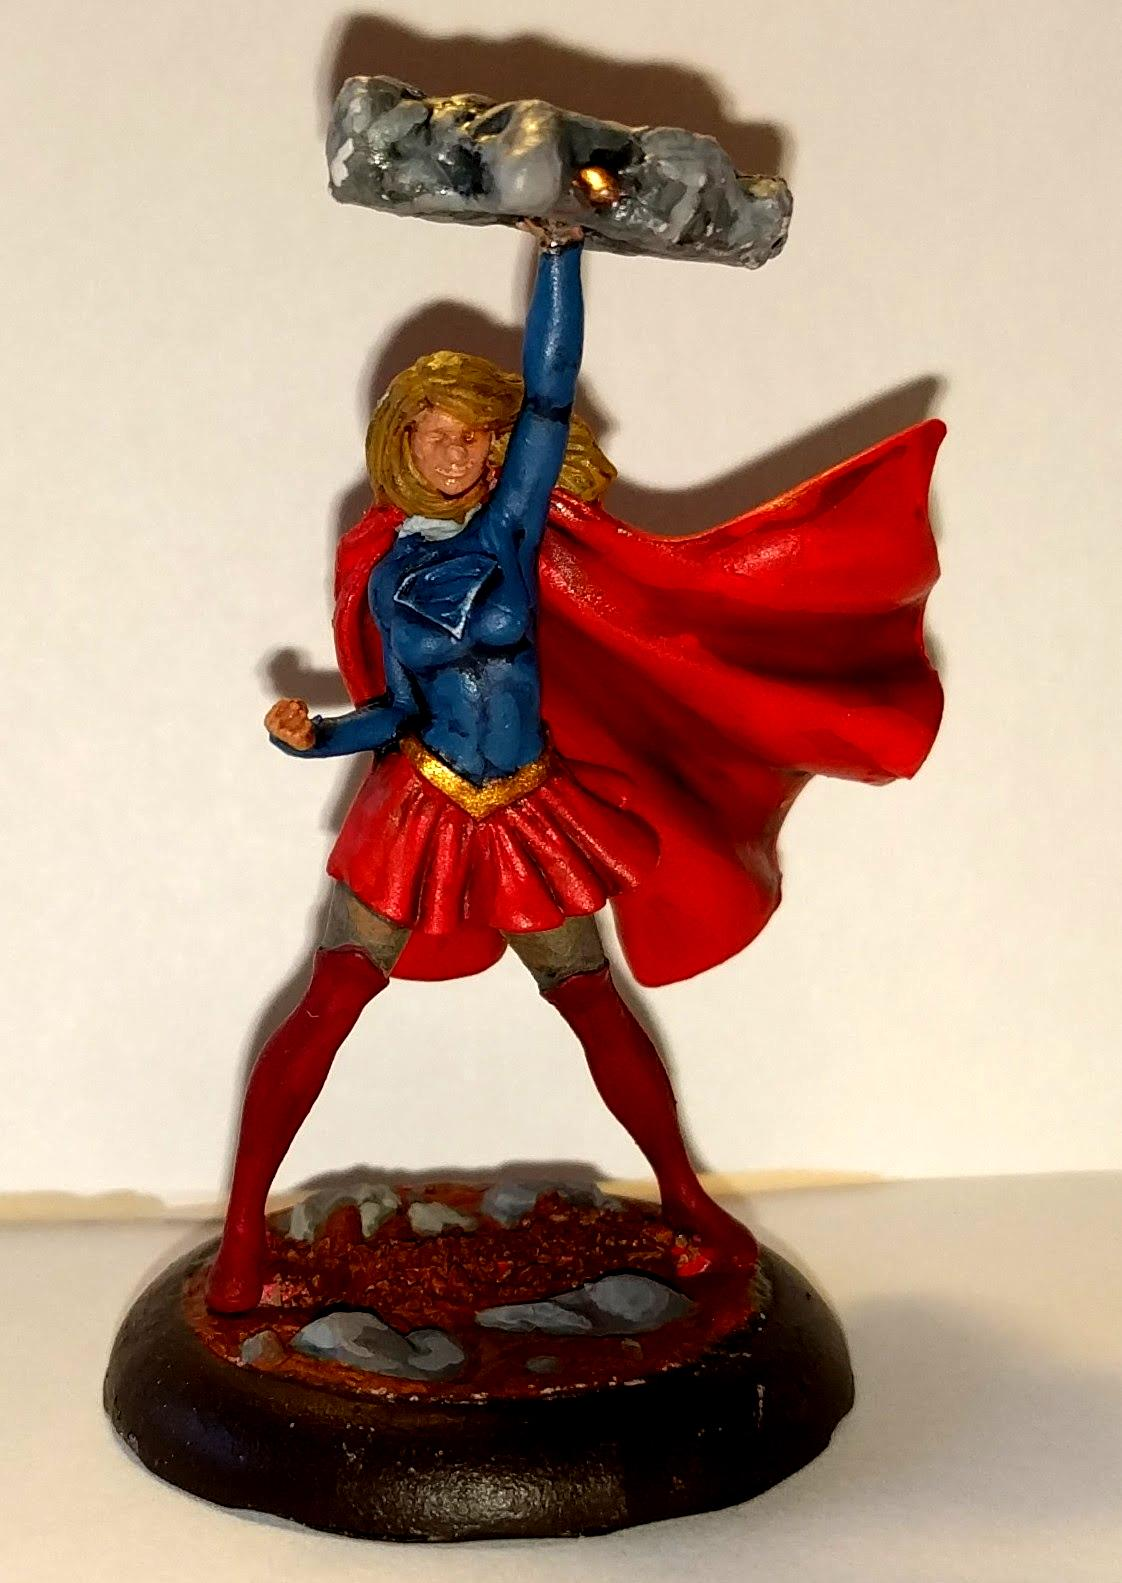 Dc, Knightmodels, Supergirl, Superman